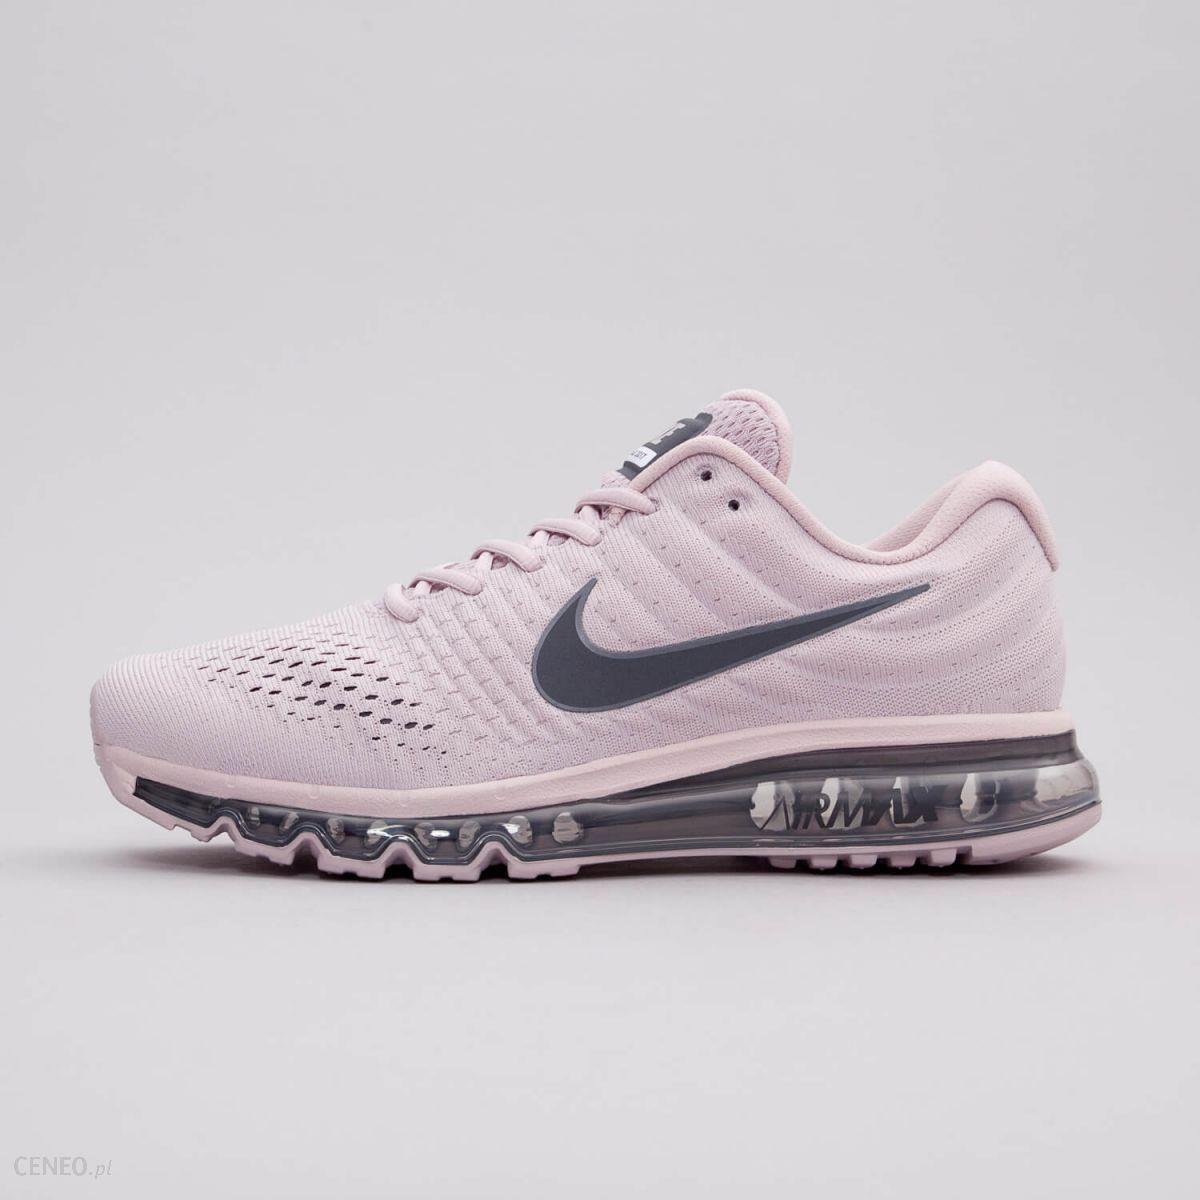 Nike Air Max 2017 Ceny i opinie Ceneo.pl